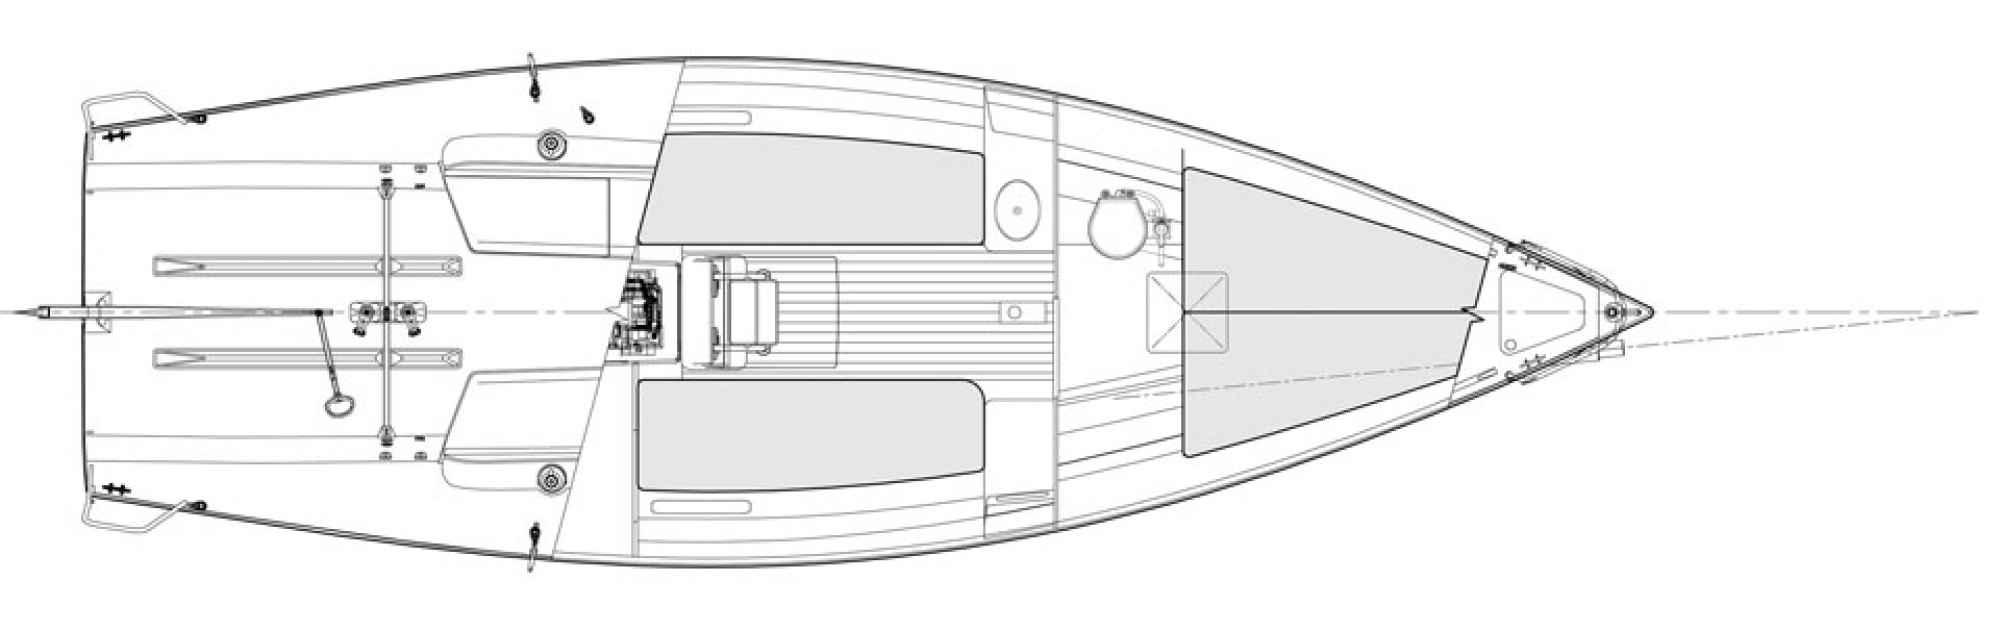 j88-interior